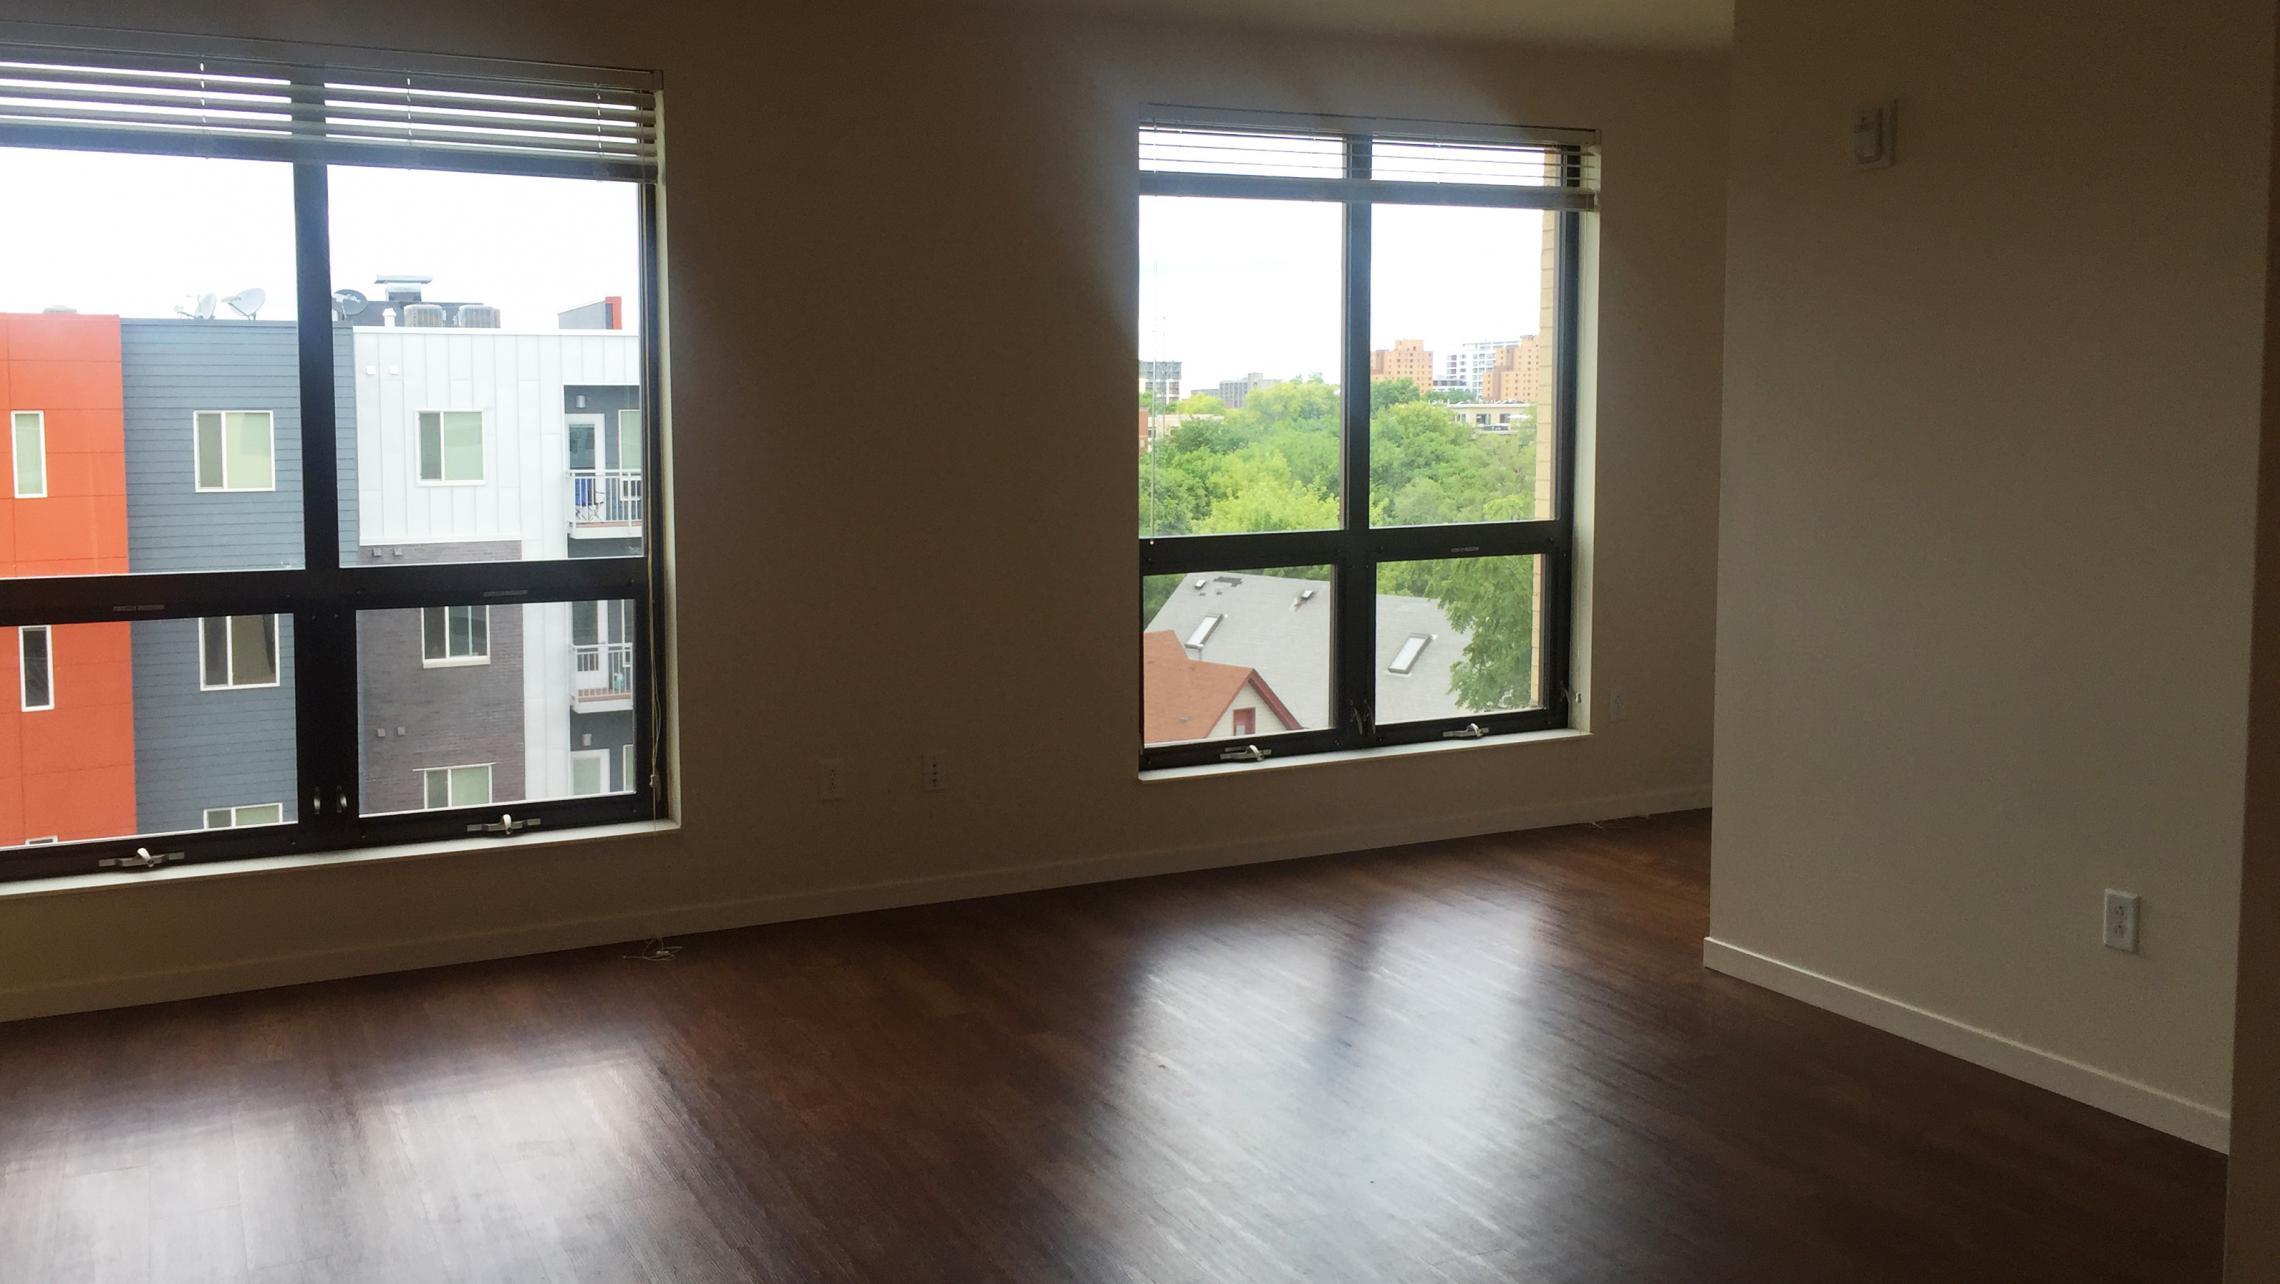 ULI Nine Line Apartment 512 - Living Room Window